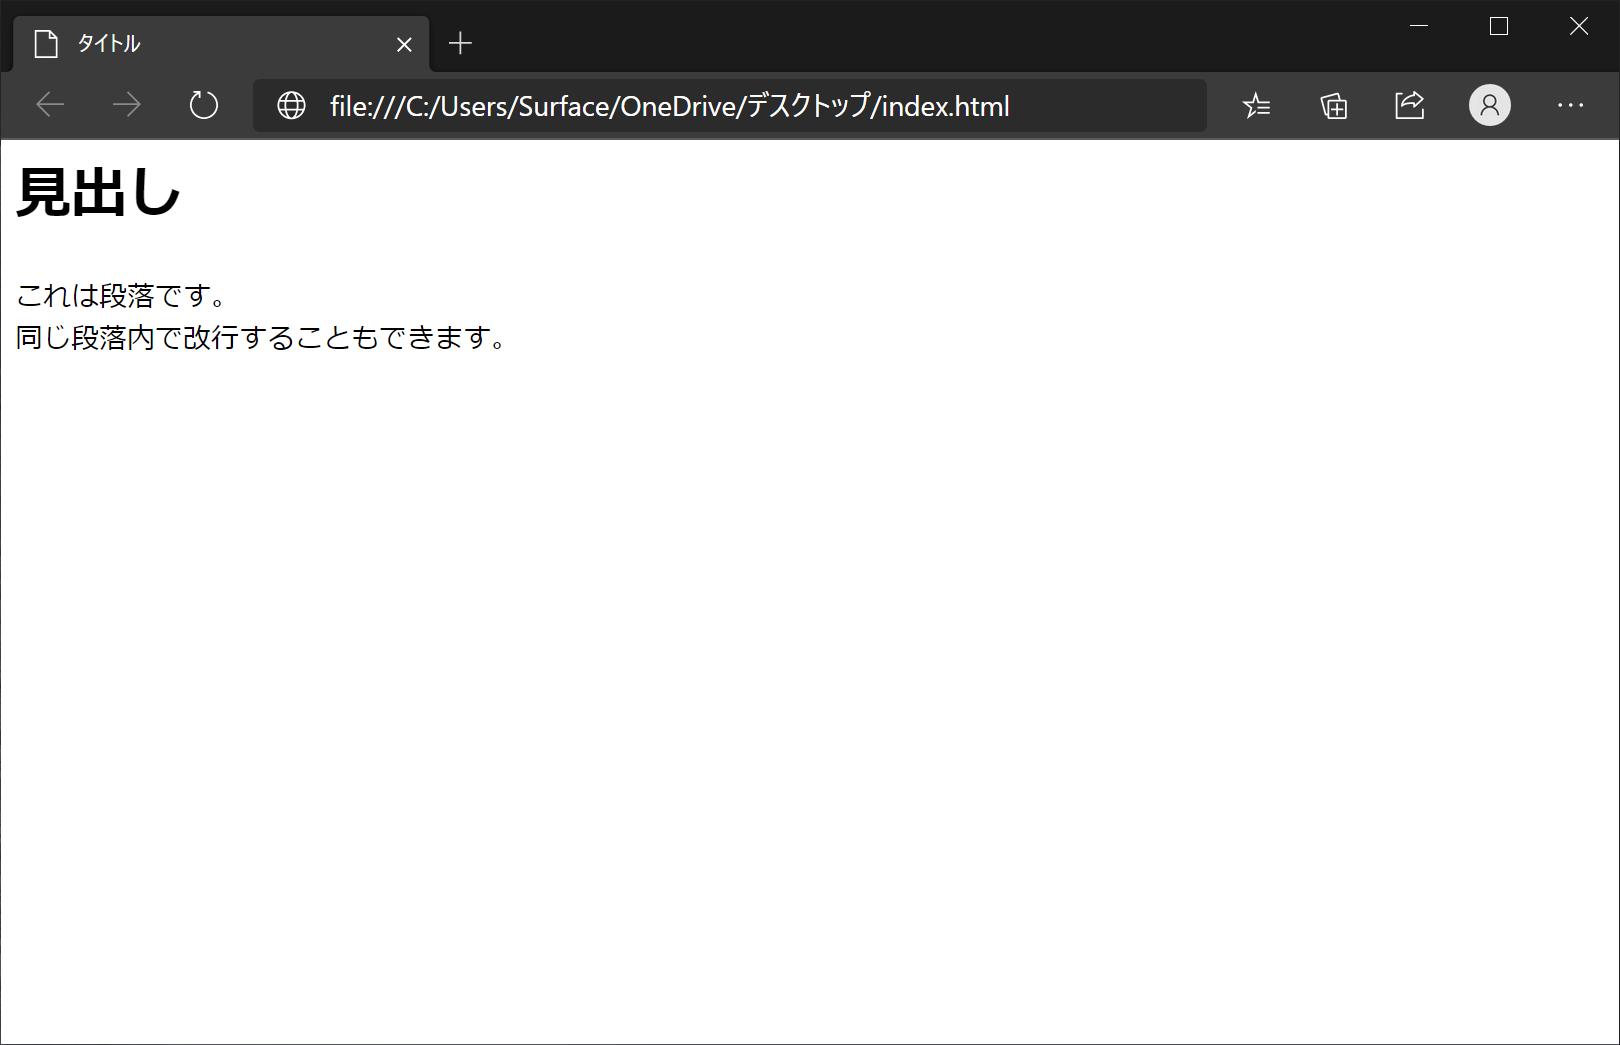 HTMLの表示結果